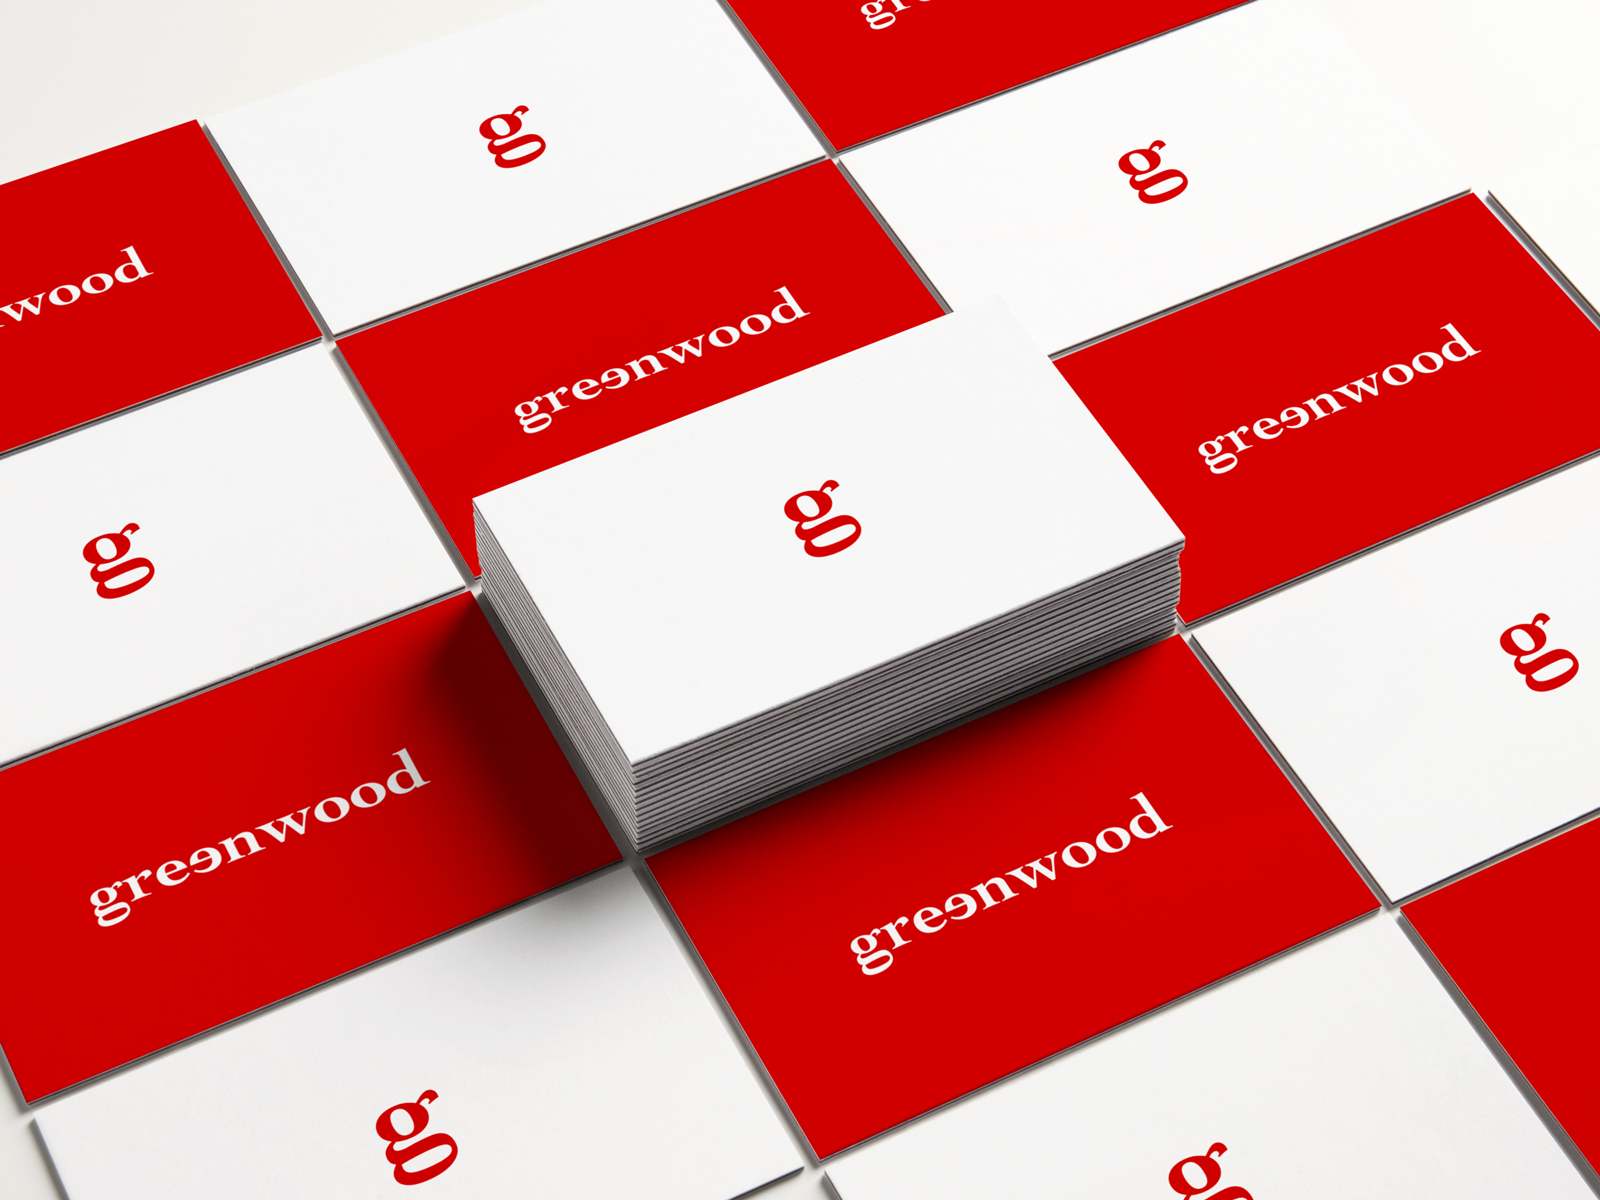 Greenwood-Cards